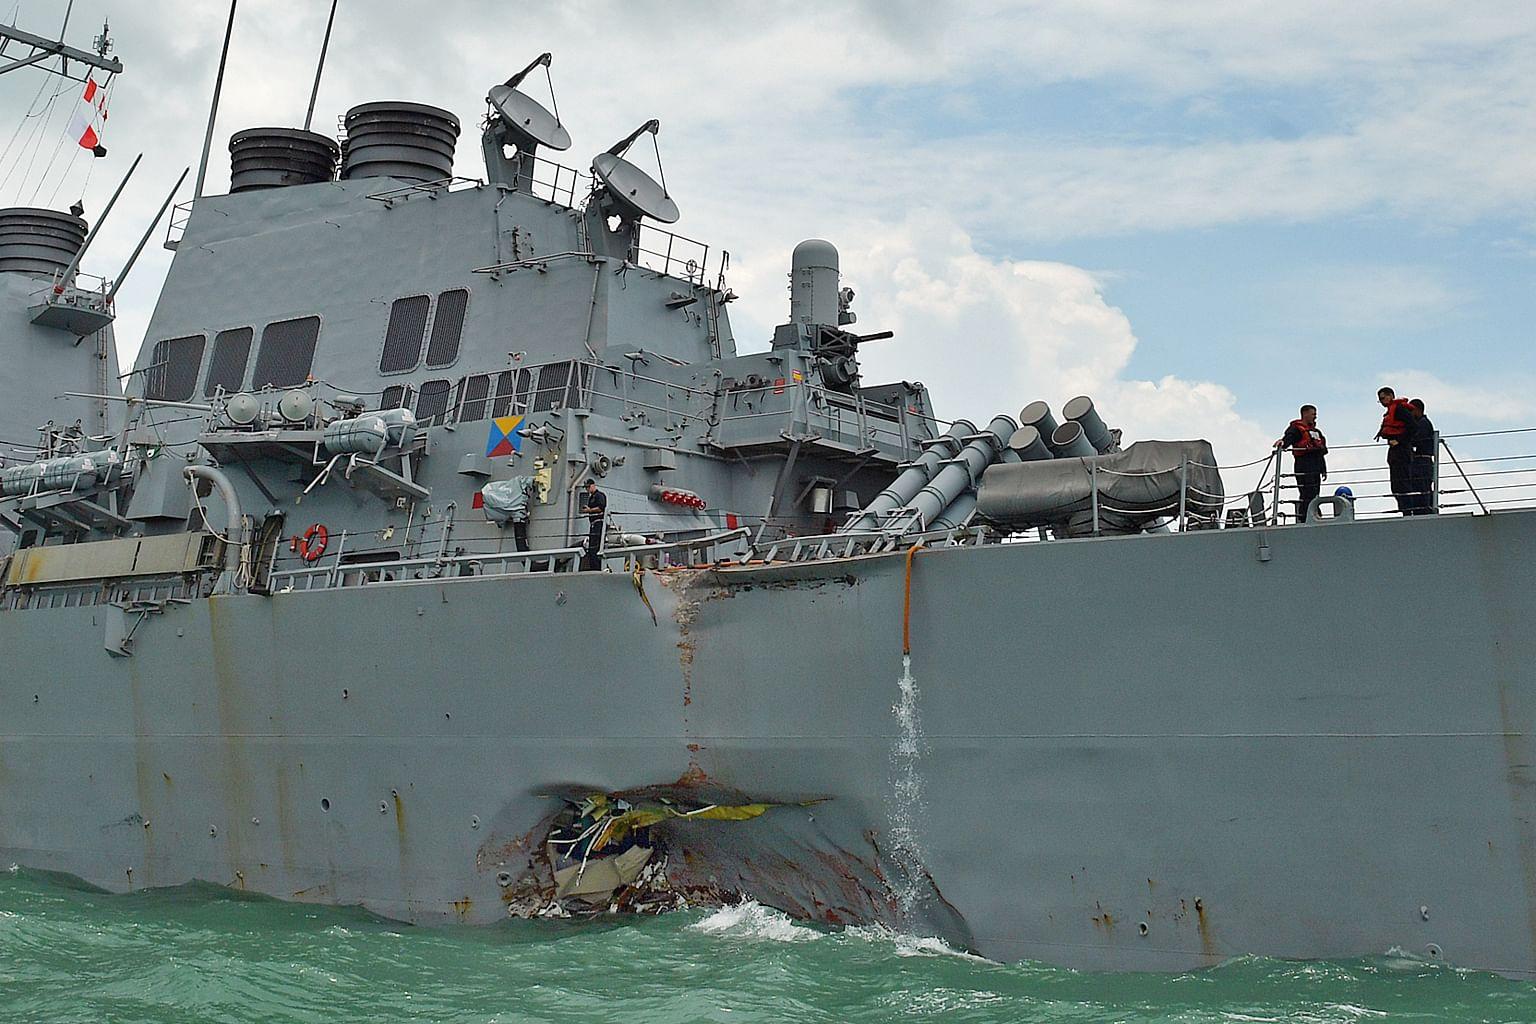 Kapal dikesan sebelum nahas, tidak dianggap timbulkan ancaman